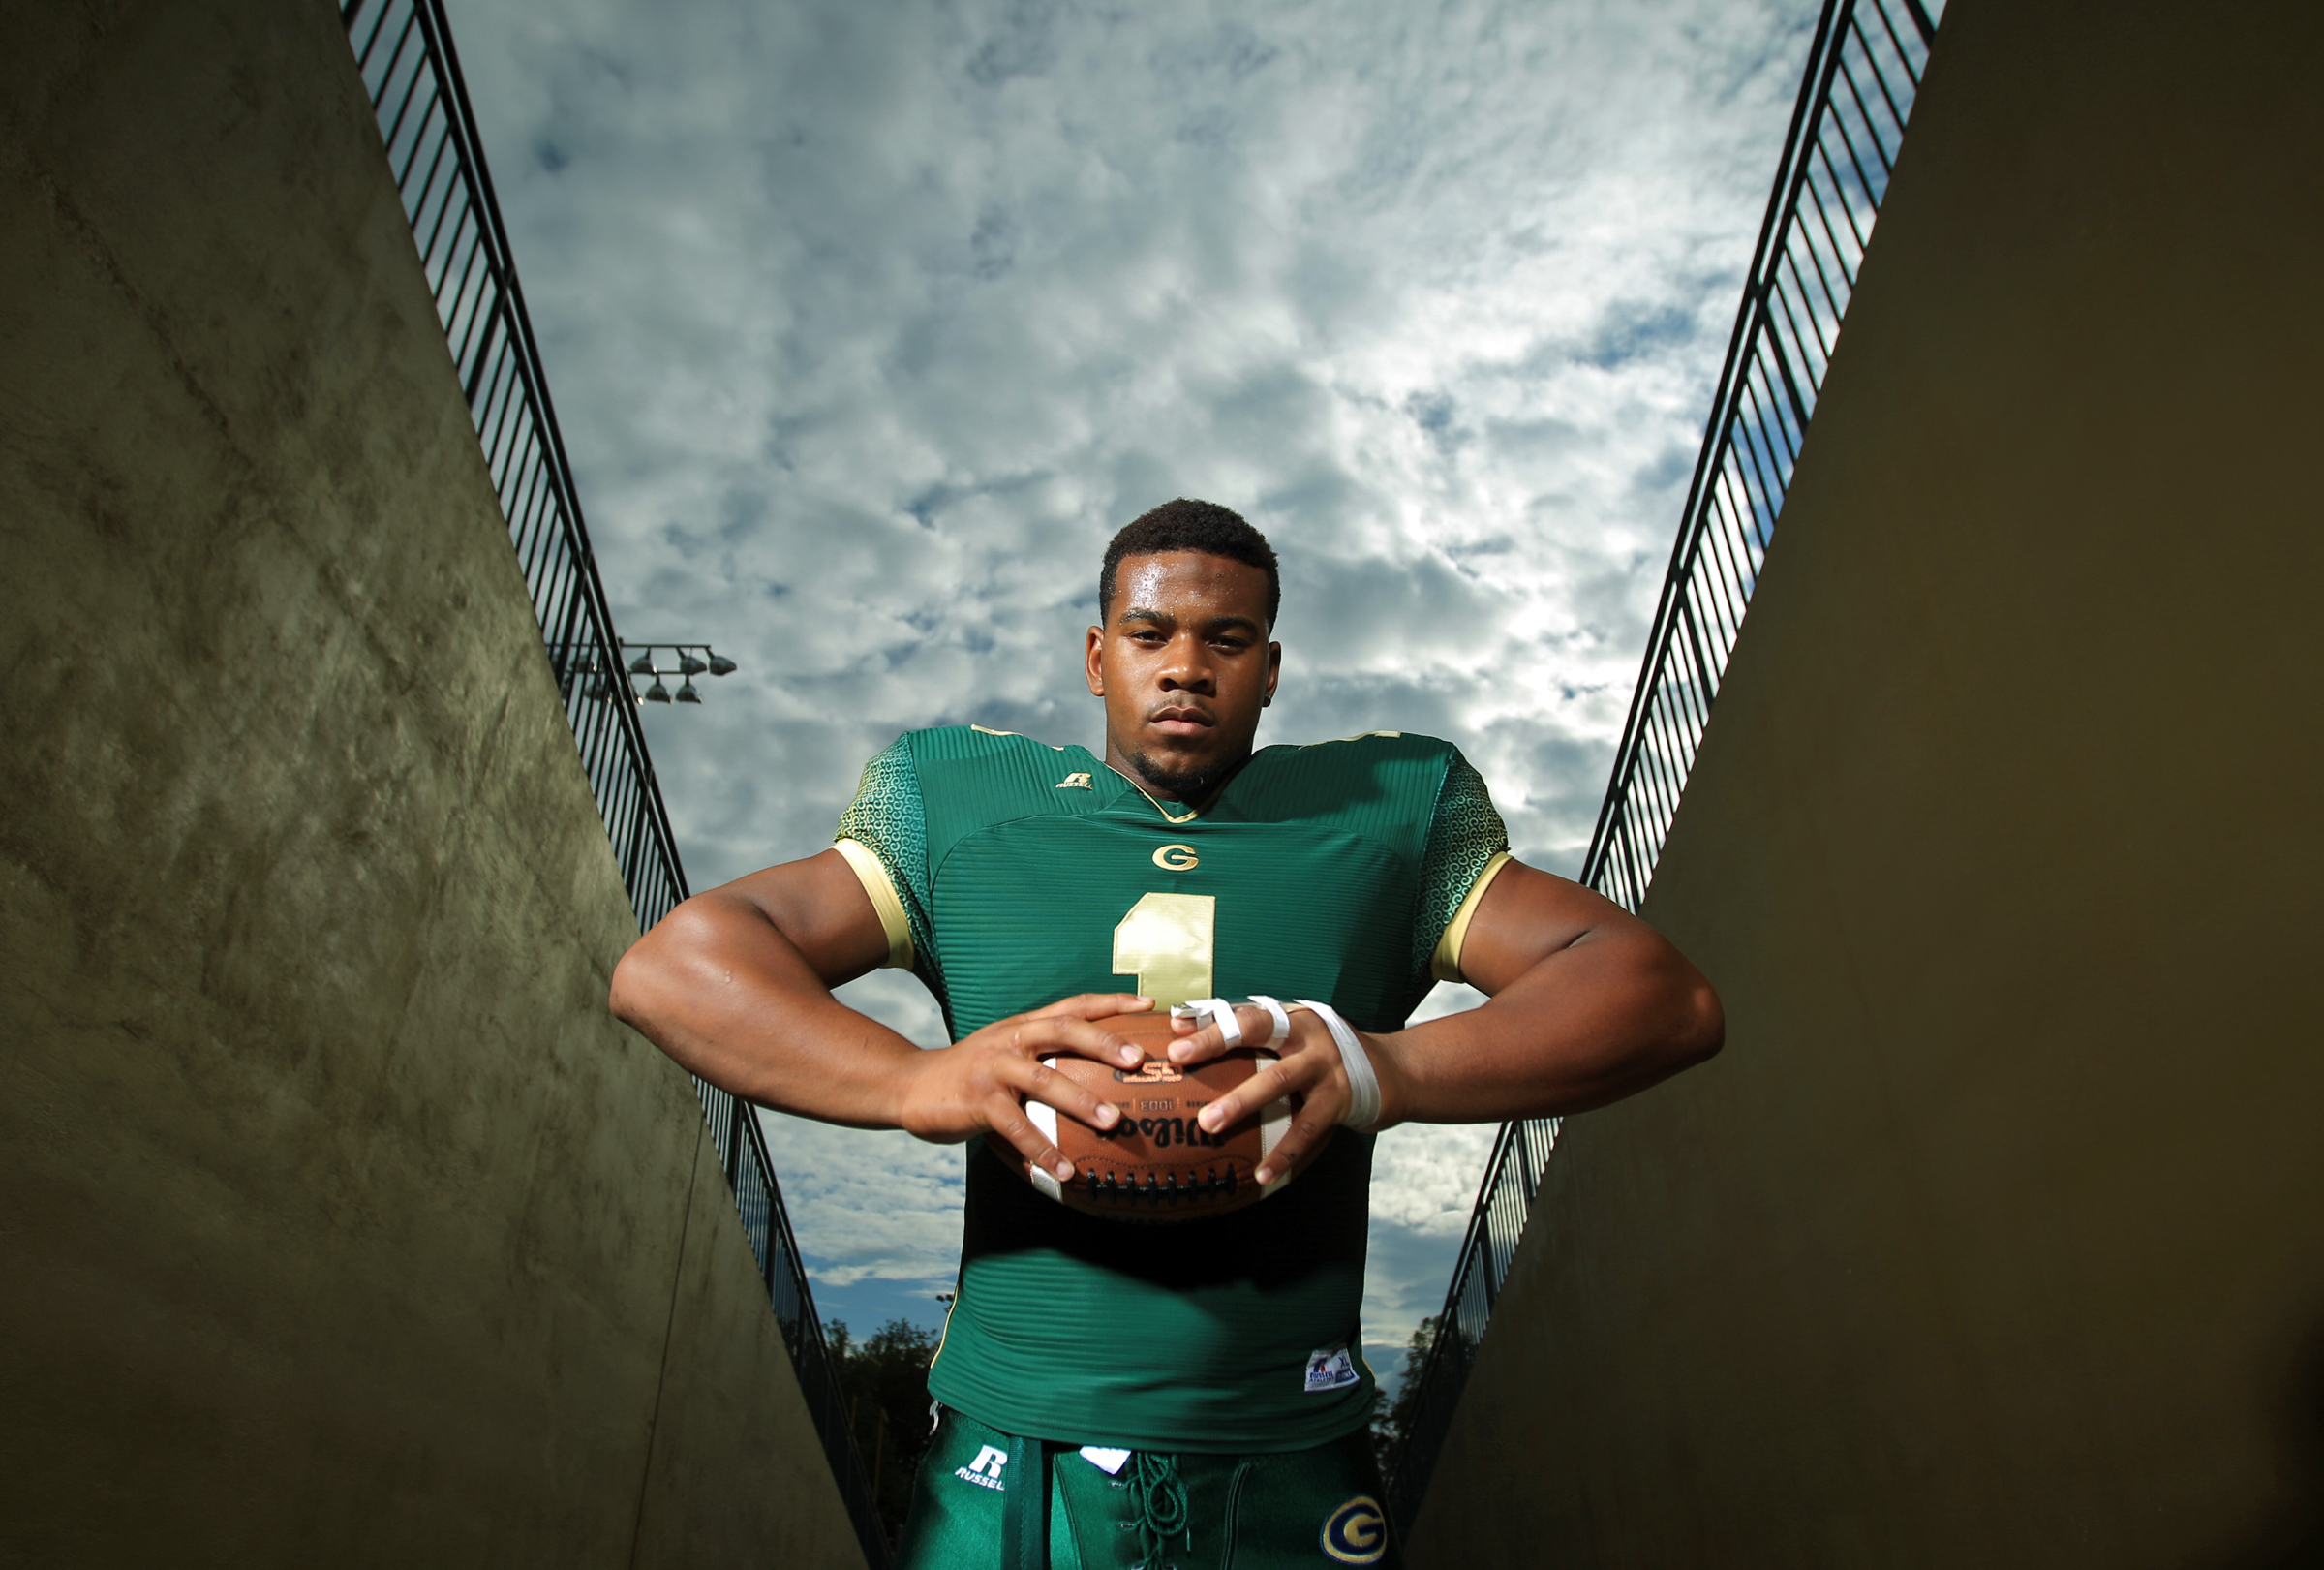 Grayson defensive lineman Robert Nkemdiche. (Photo: Jason Getz, AP)